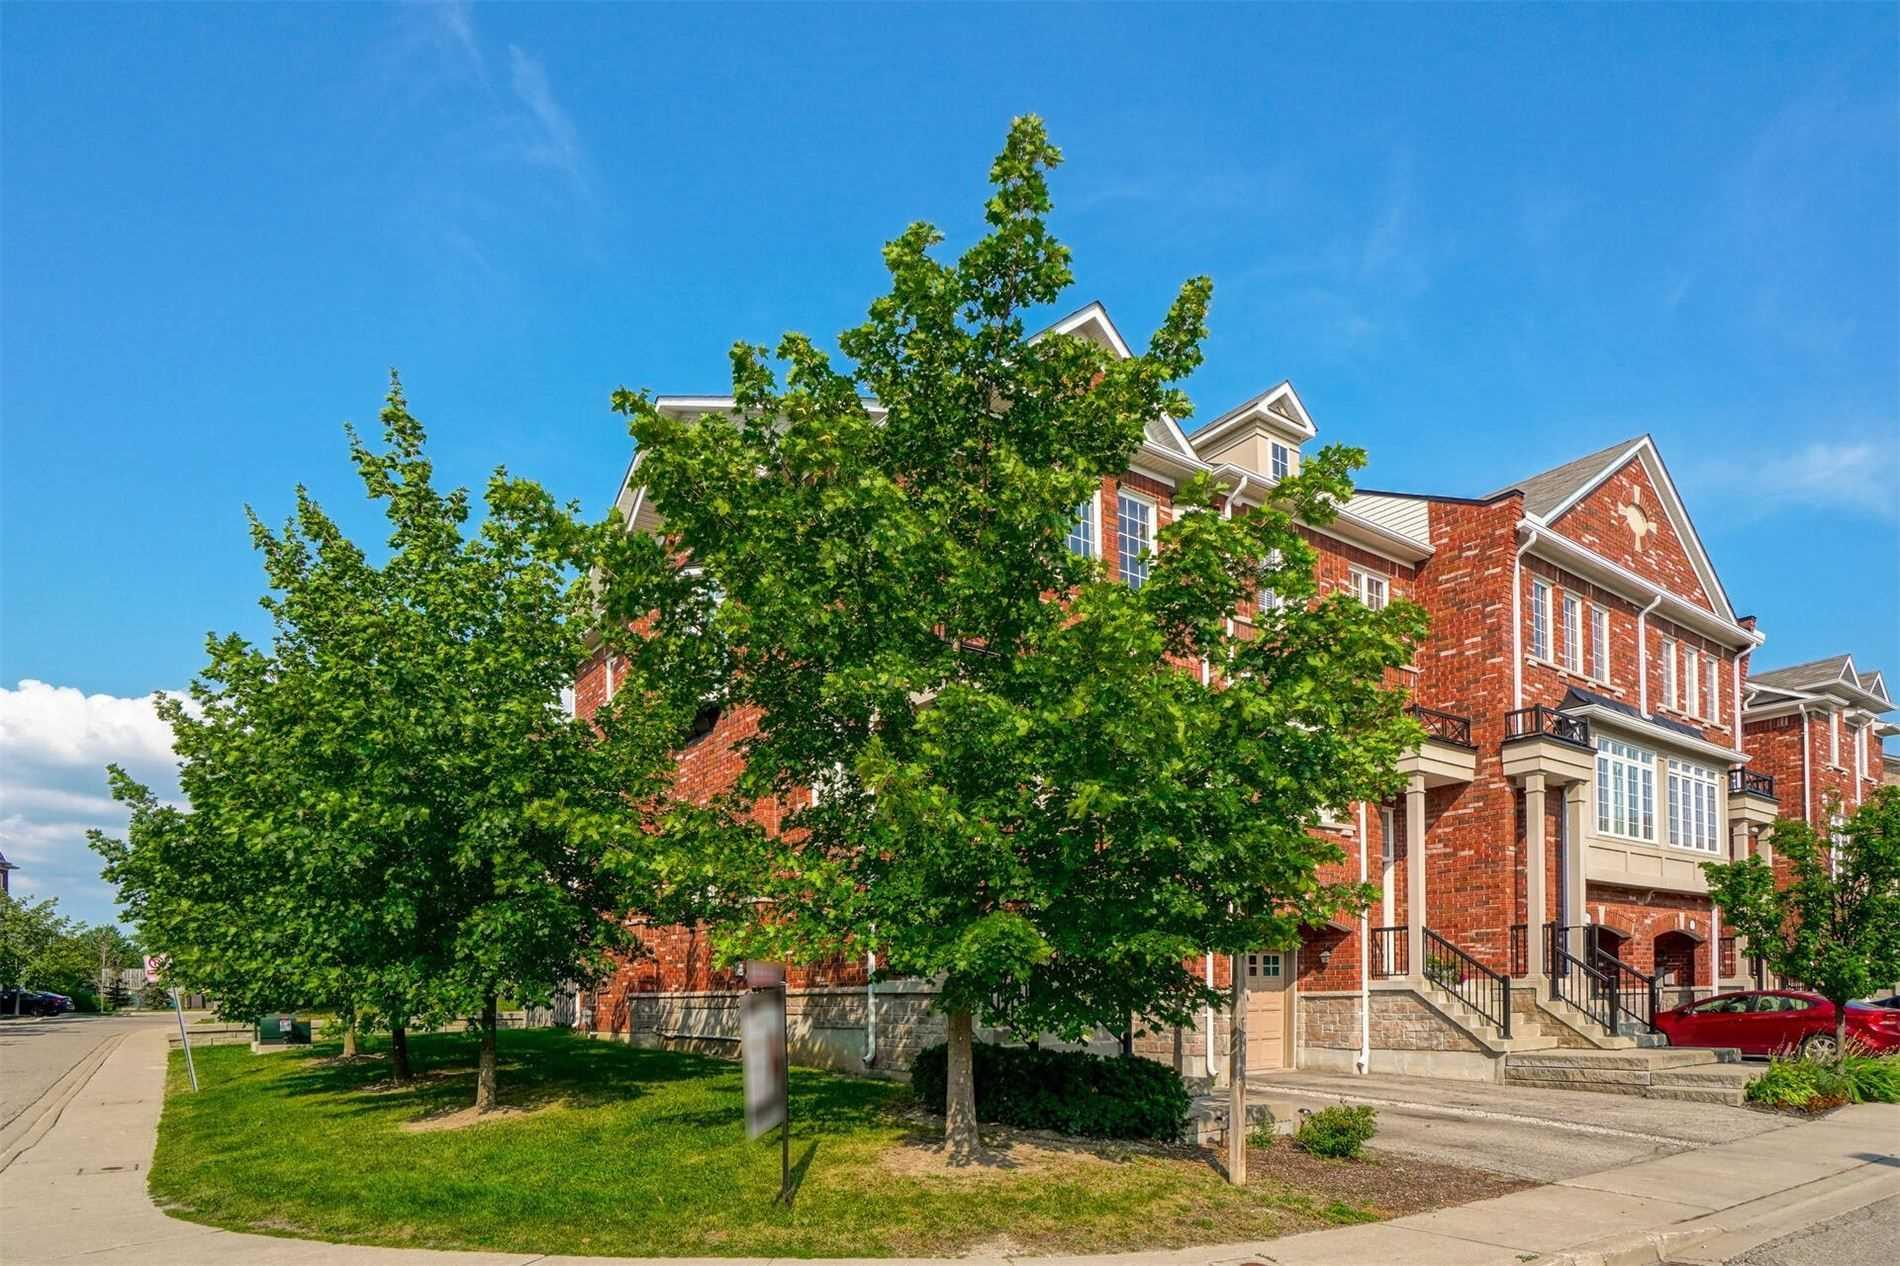 7233 Triumph Lane, Mississauga, Ontario L5N0C5, 3 Bedrooms Bedrooms, 8 Rooms Rooms,3 BathroomsBathrooms,Condo Townhouse,For Sale,Triumph,W5334848